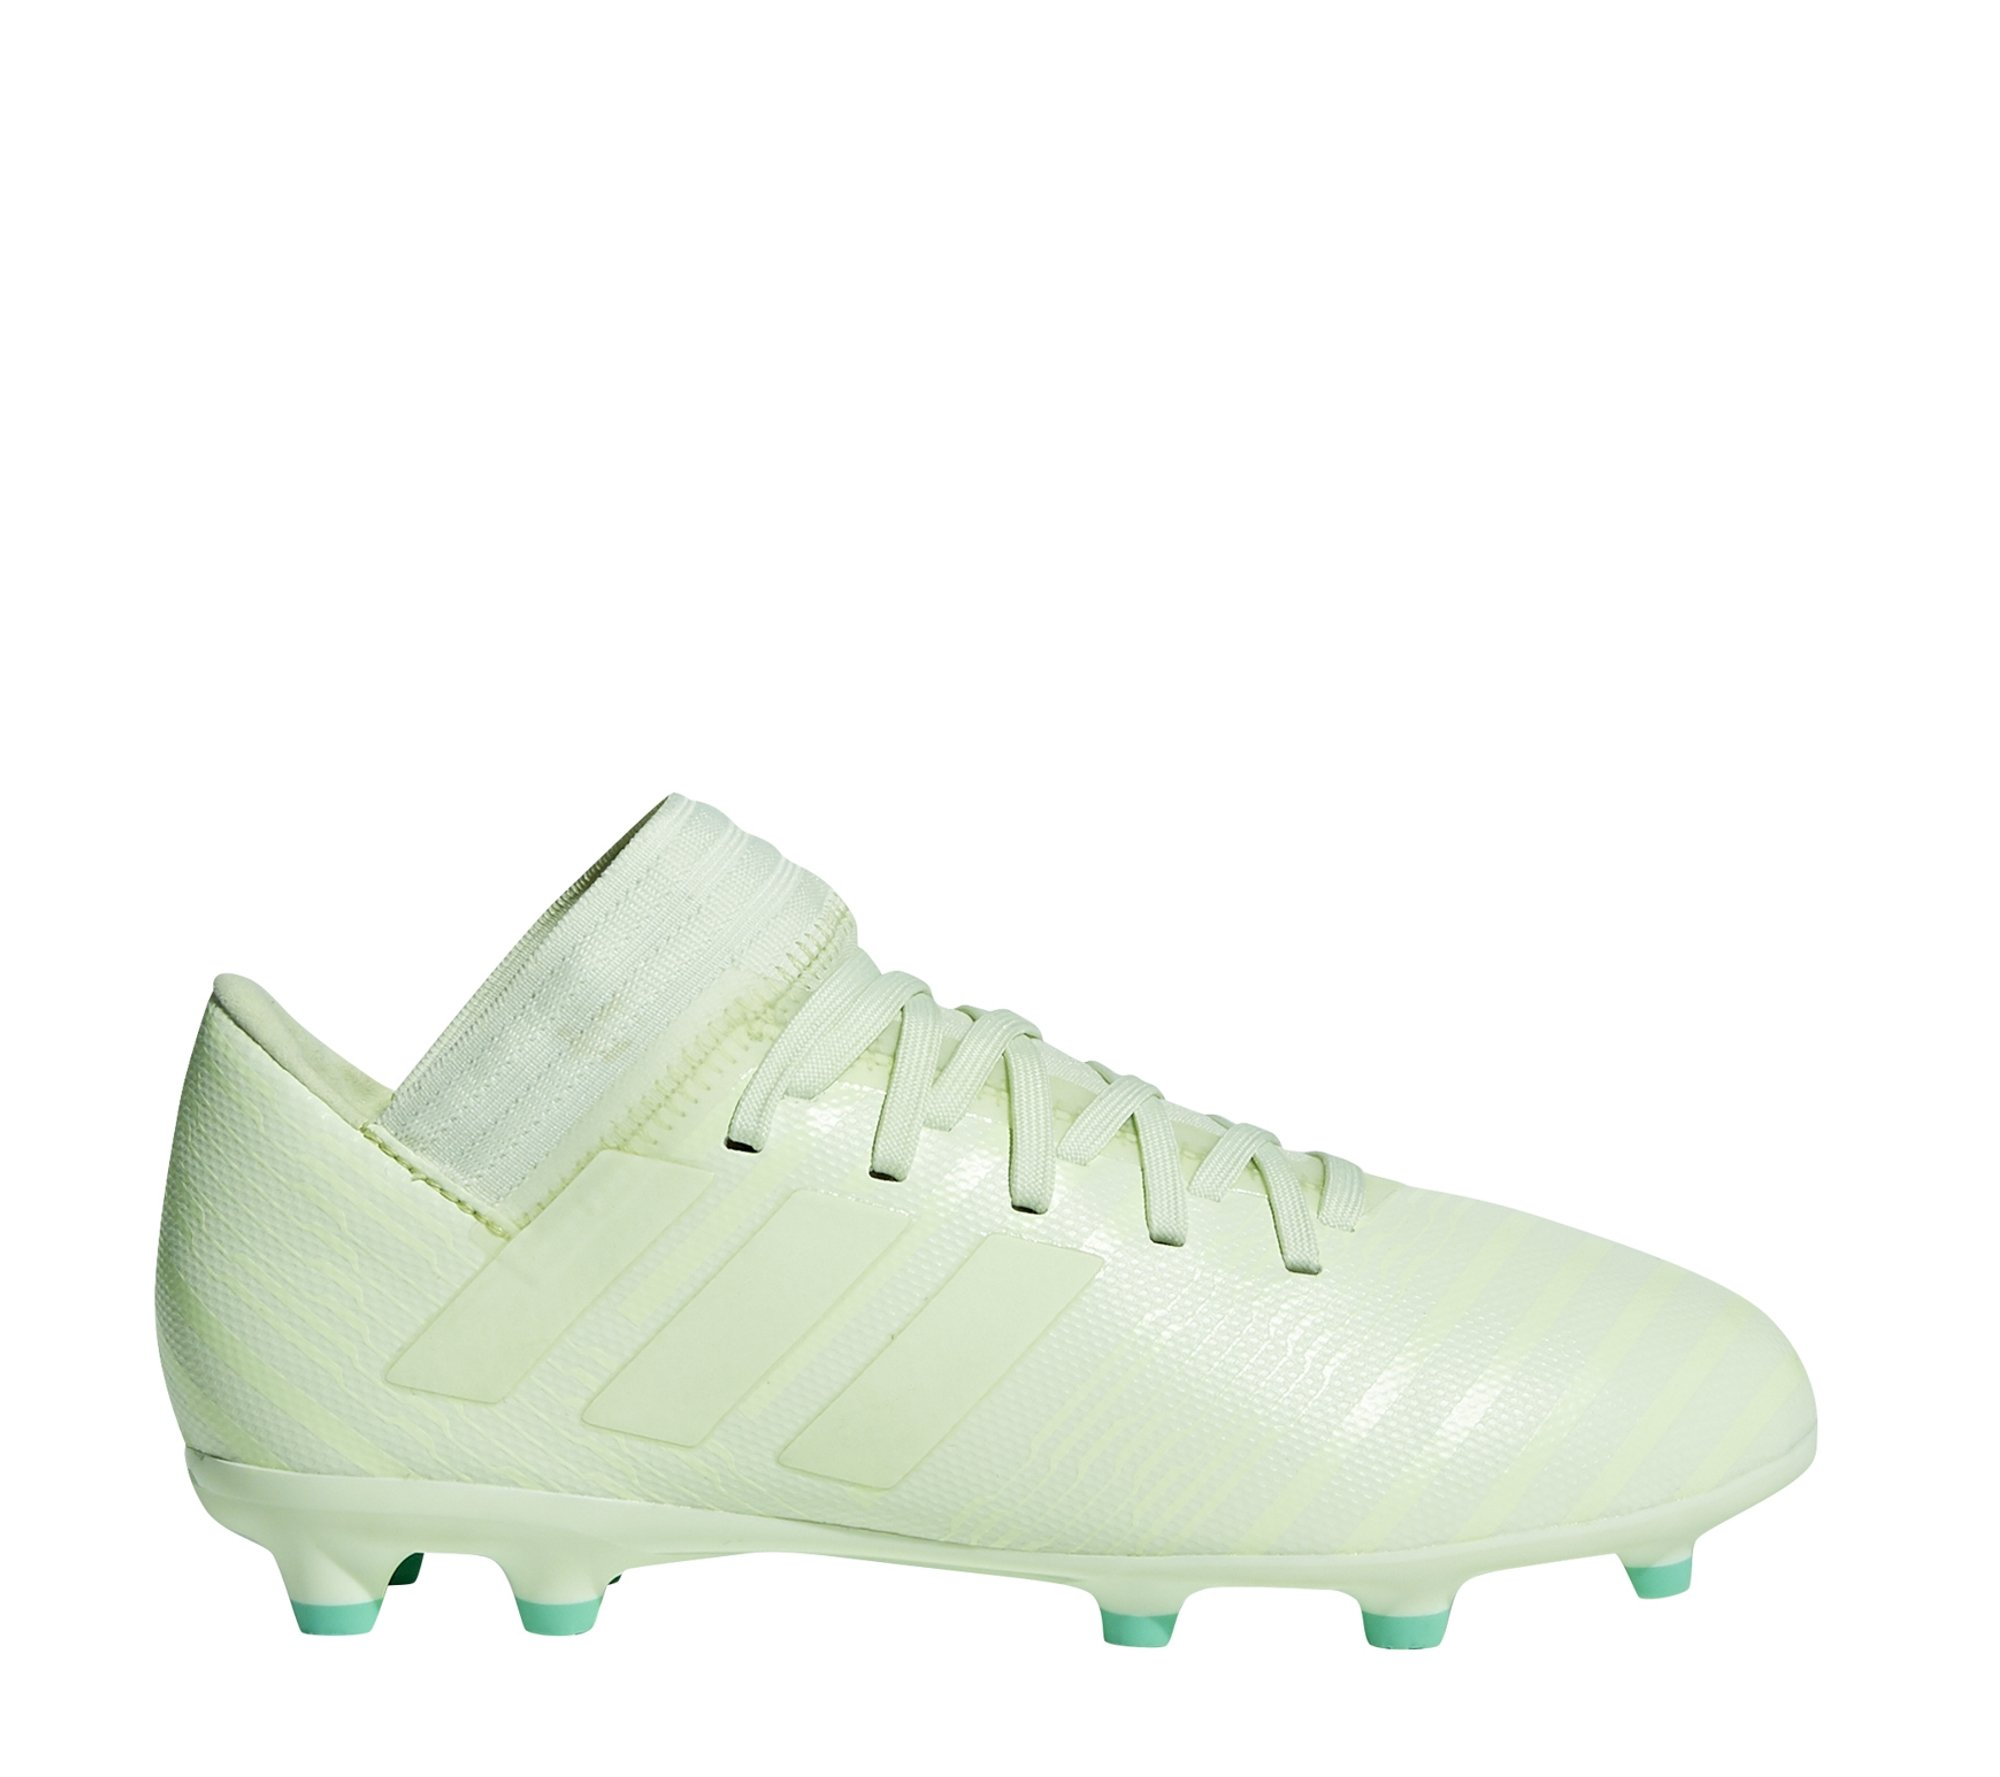 the best attitude 878eb a7324 wit groene Kids Voetbalschoen Adidas Nemiziz 17.3 FG J - CP9167